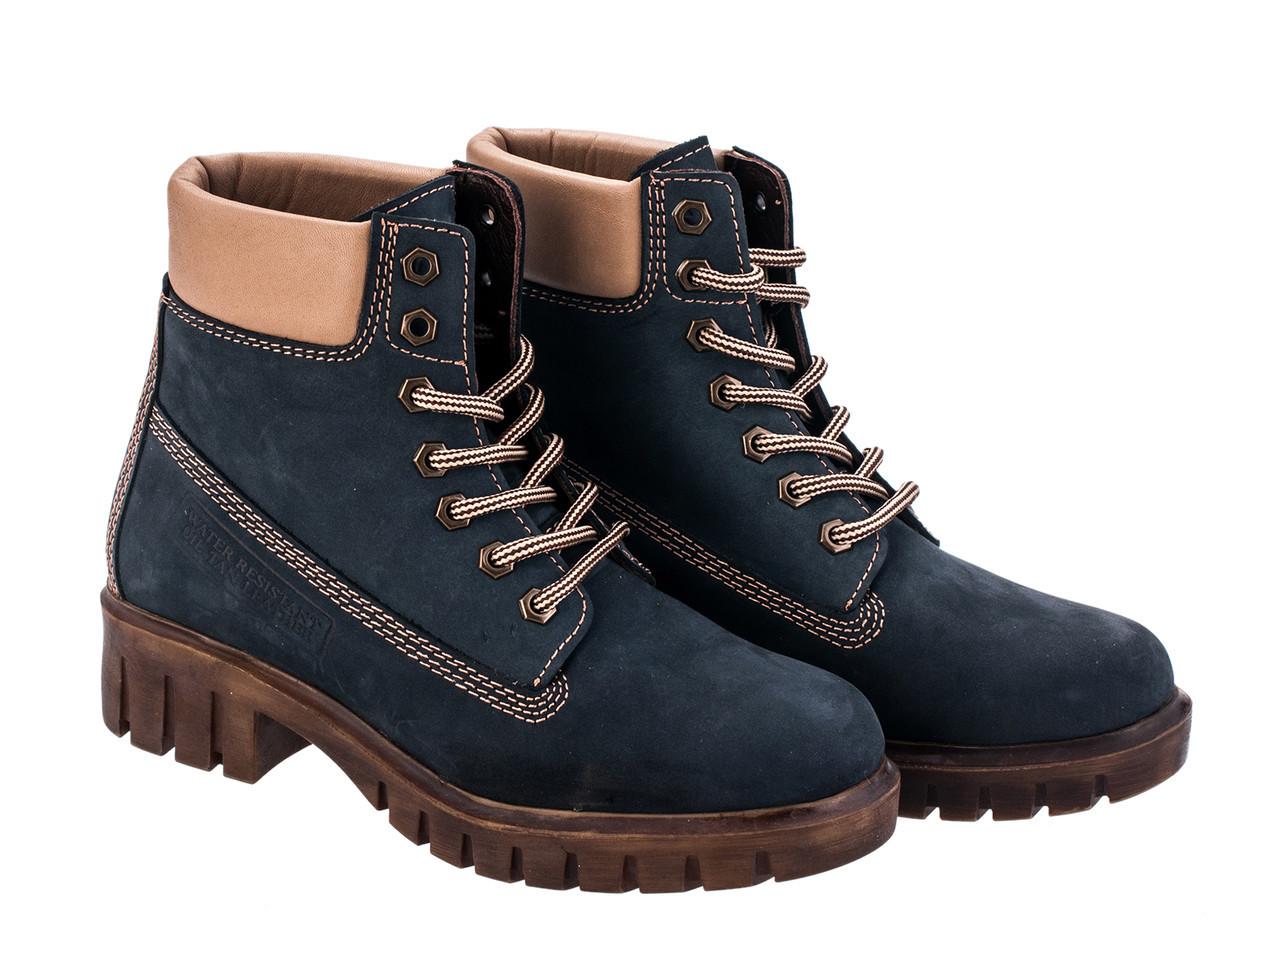 Ботинки Etor 5169-21554-823 36 синие